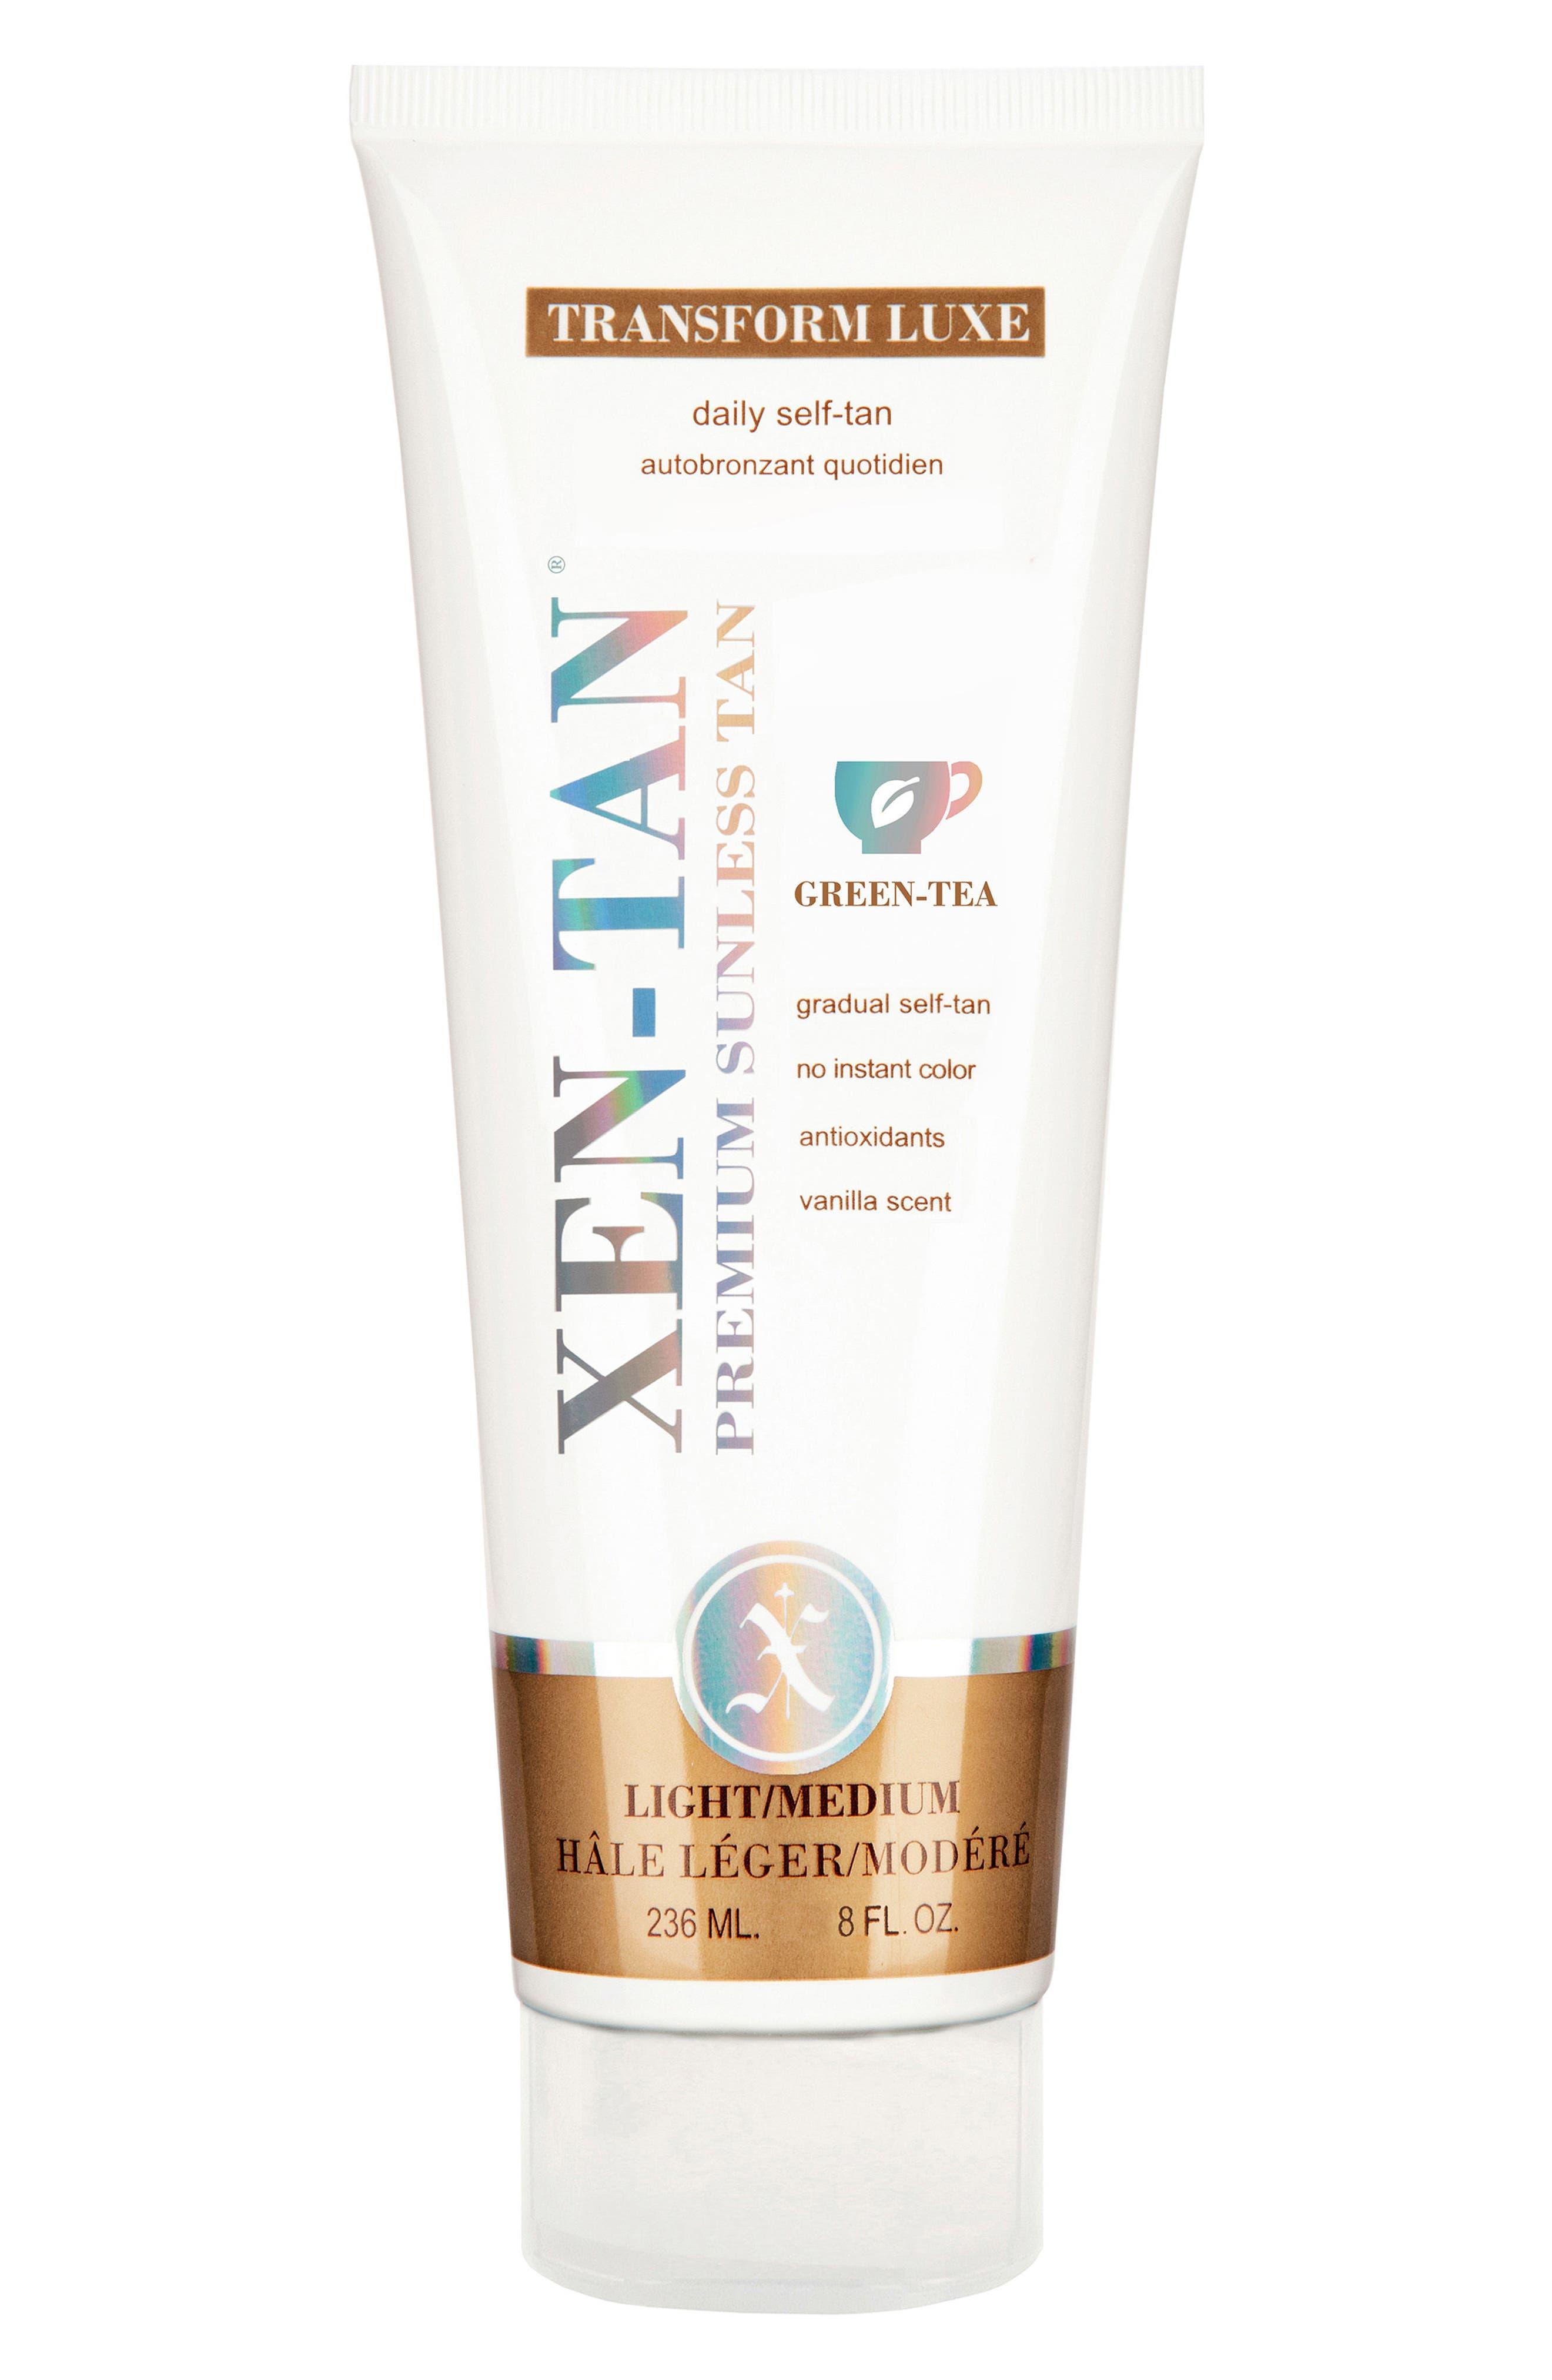 Xen-Tan® 'Transform Luxe' Premium Sunless Tan